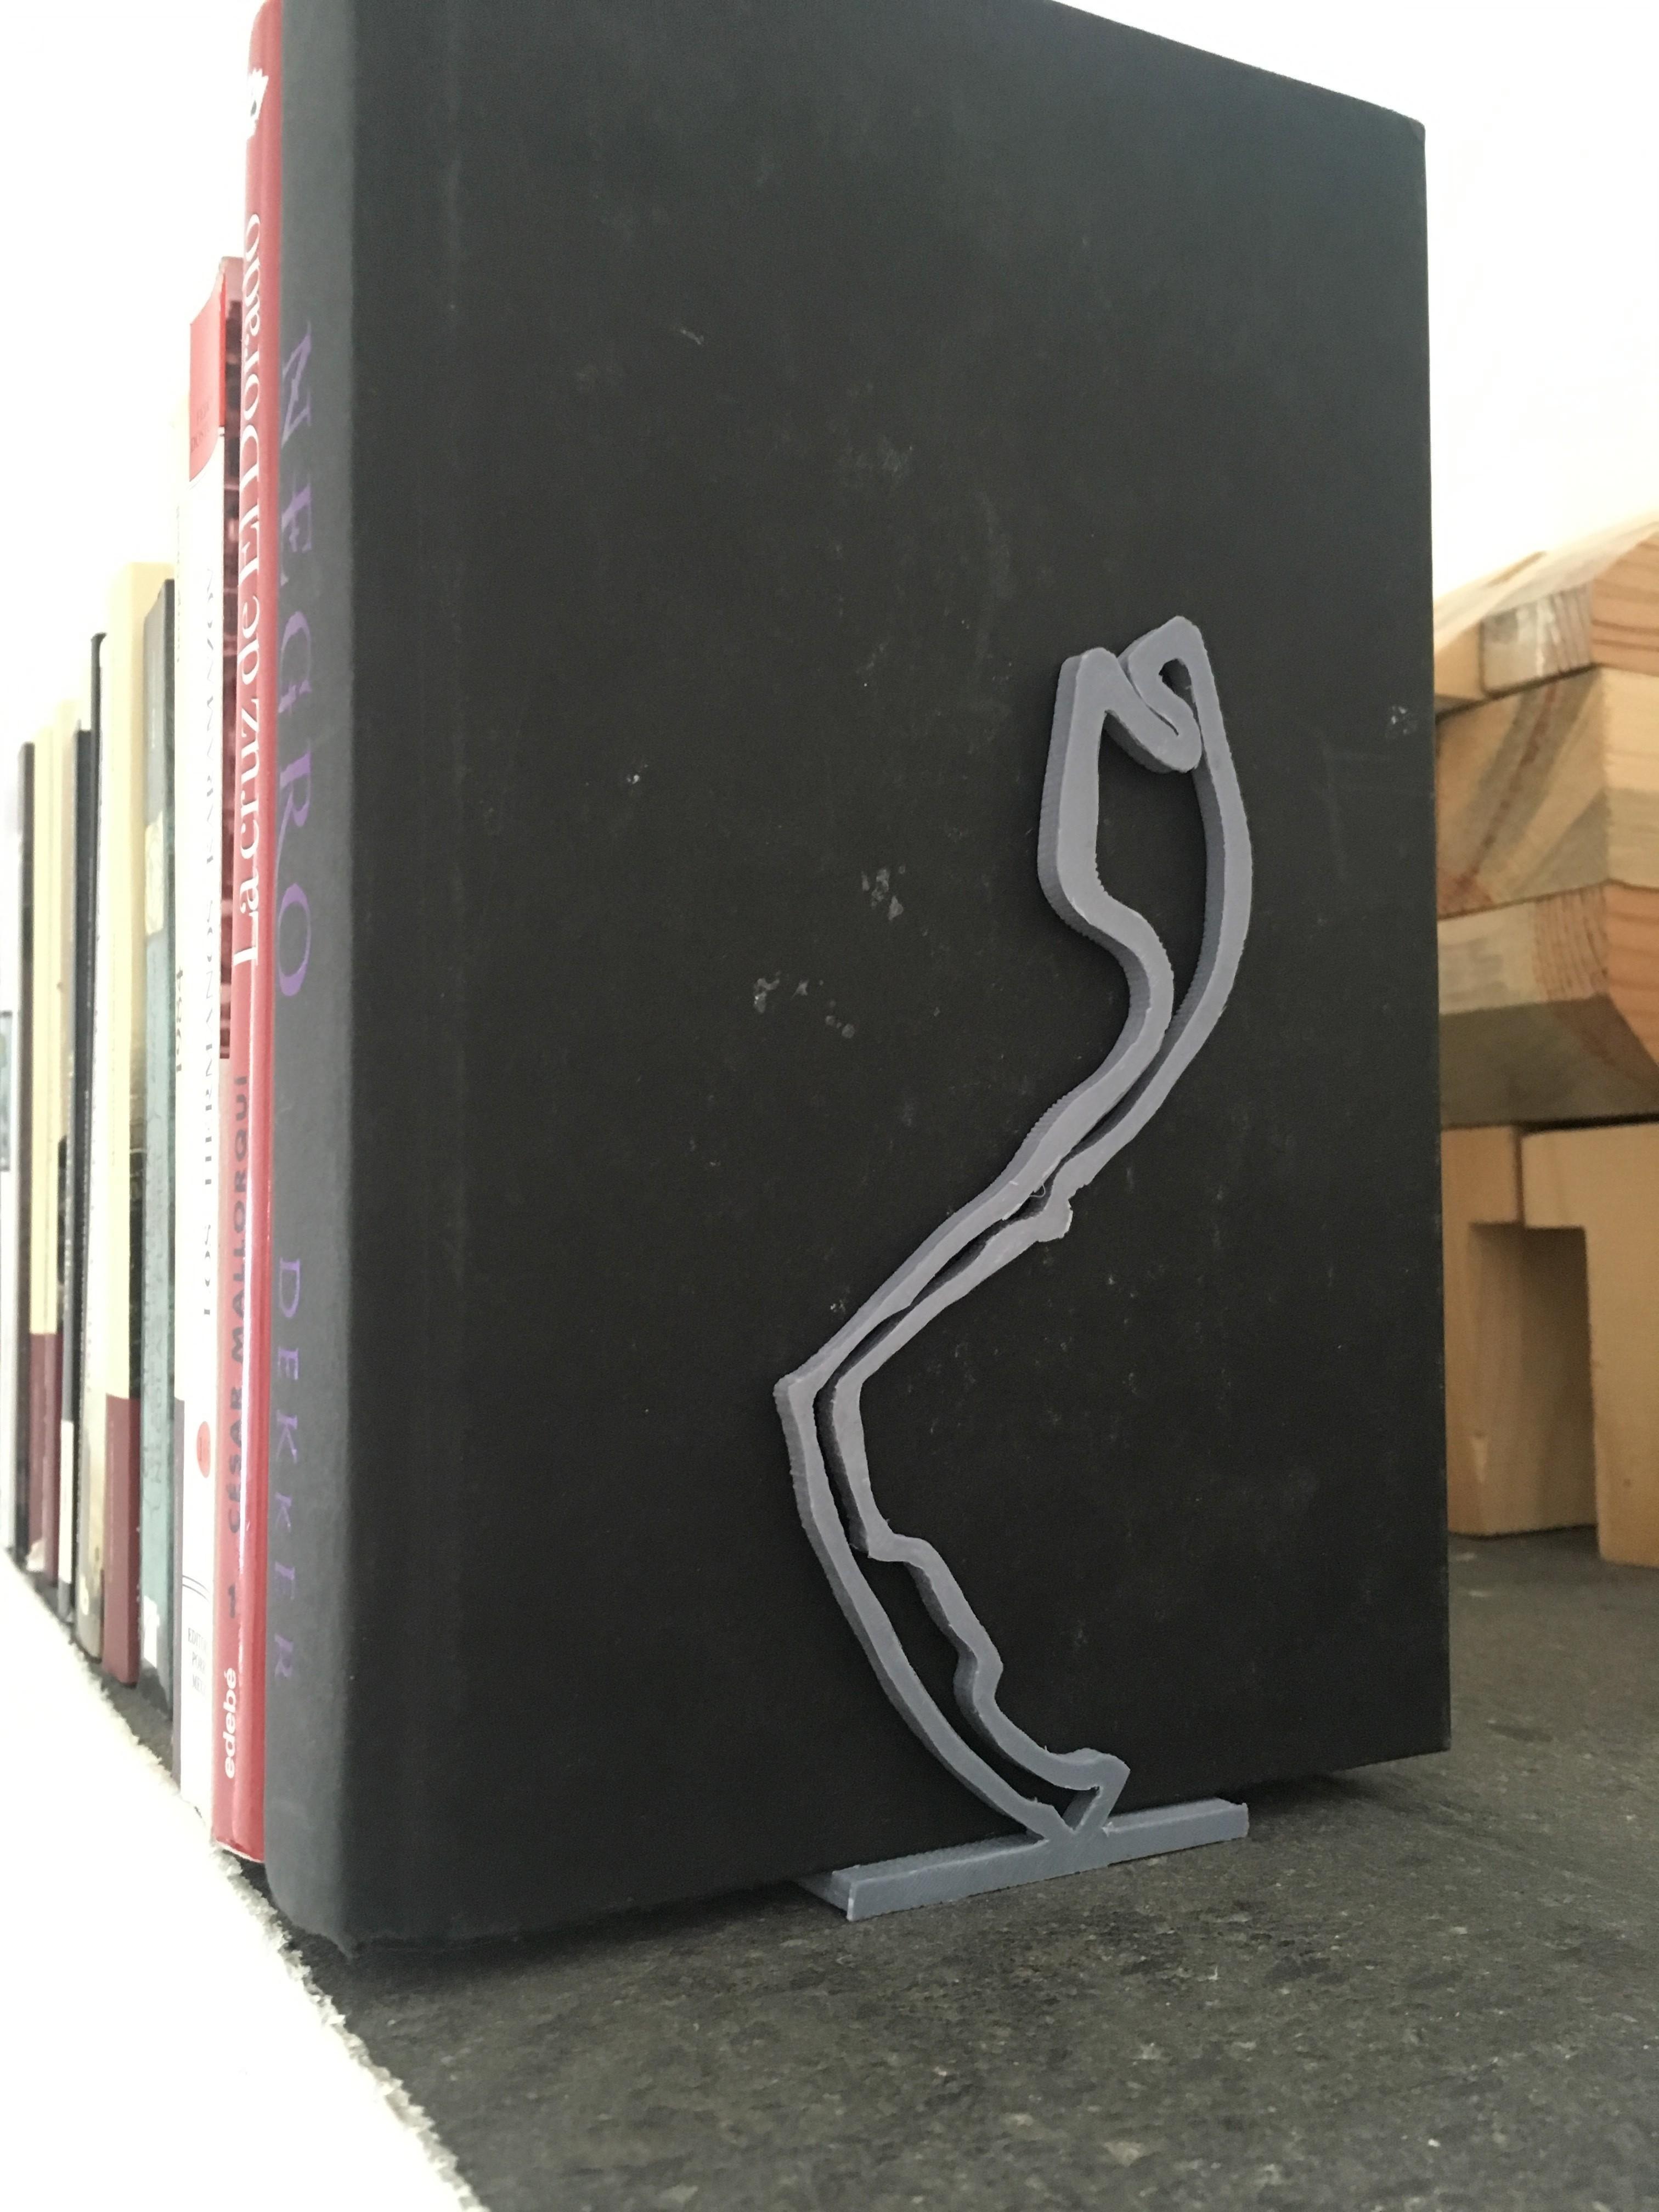 IMG_4474.JPG Télécharger fichier STL gratuit Formula 1 Book Support Monaco & Nürburgring Track • Design imprimable en 3D, ALO